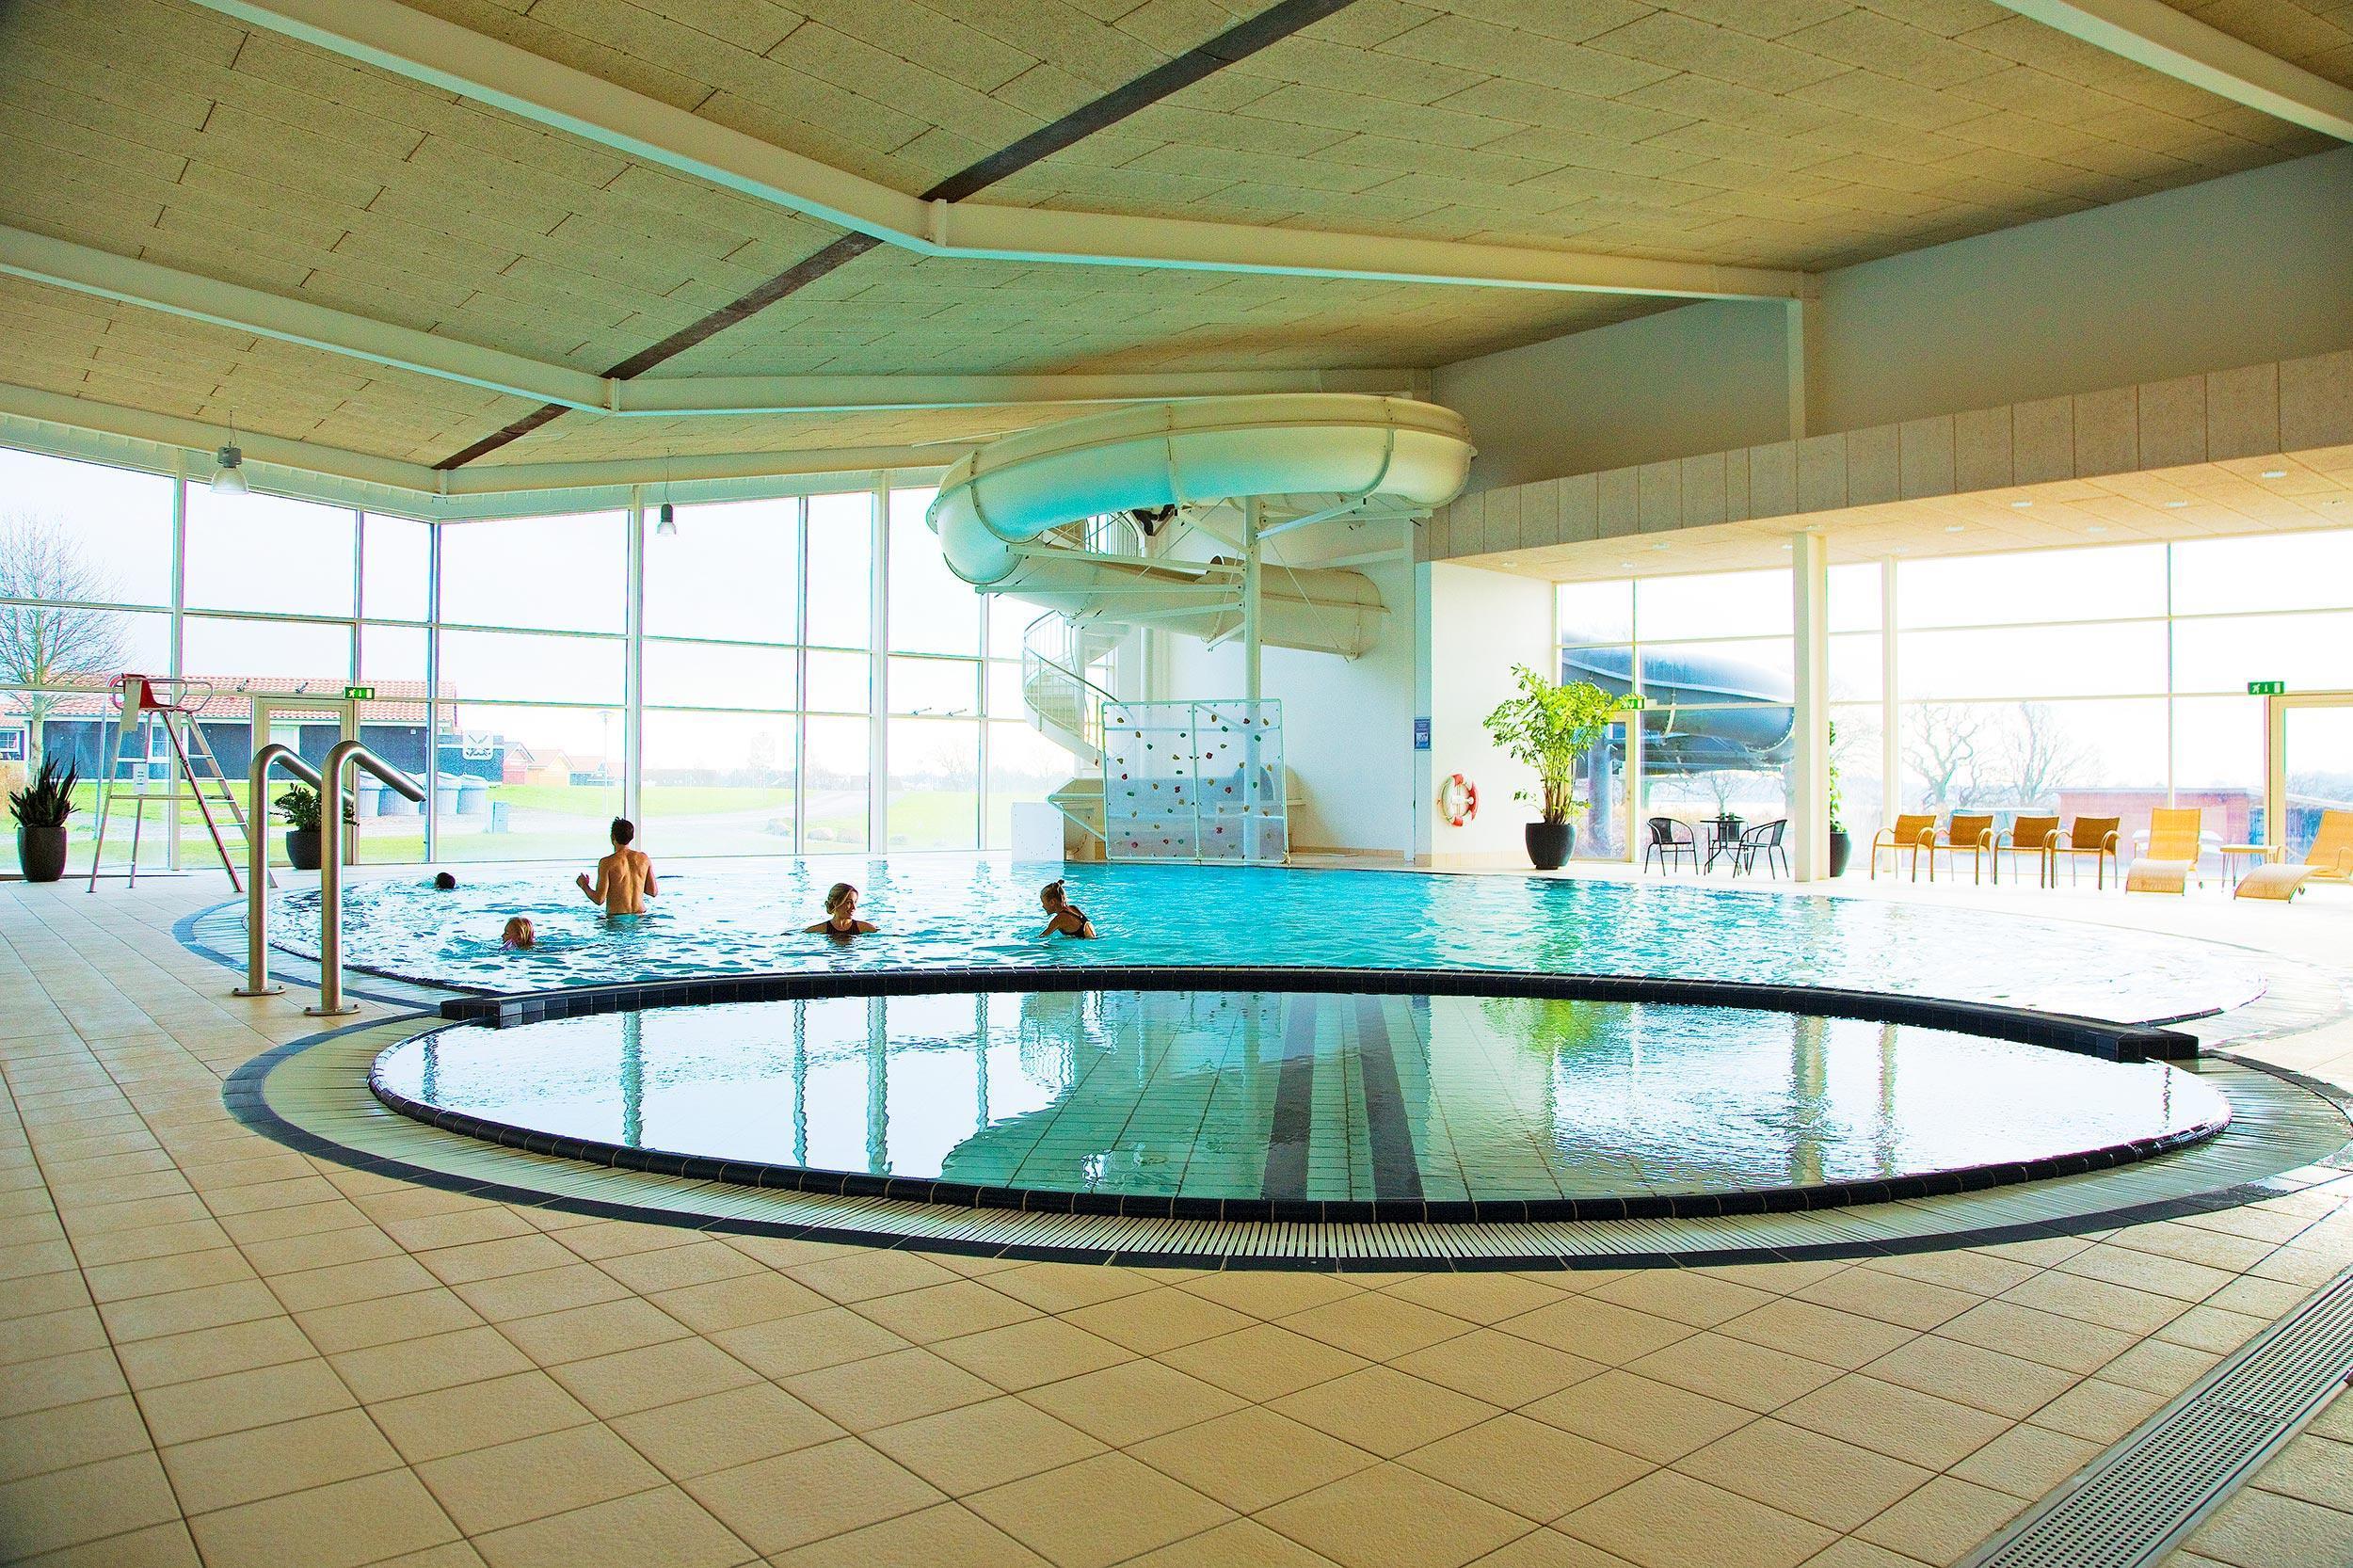 Feriehus d8   100 m²   enjoy resorts marina fiskenæs   3047 011 ...